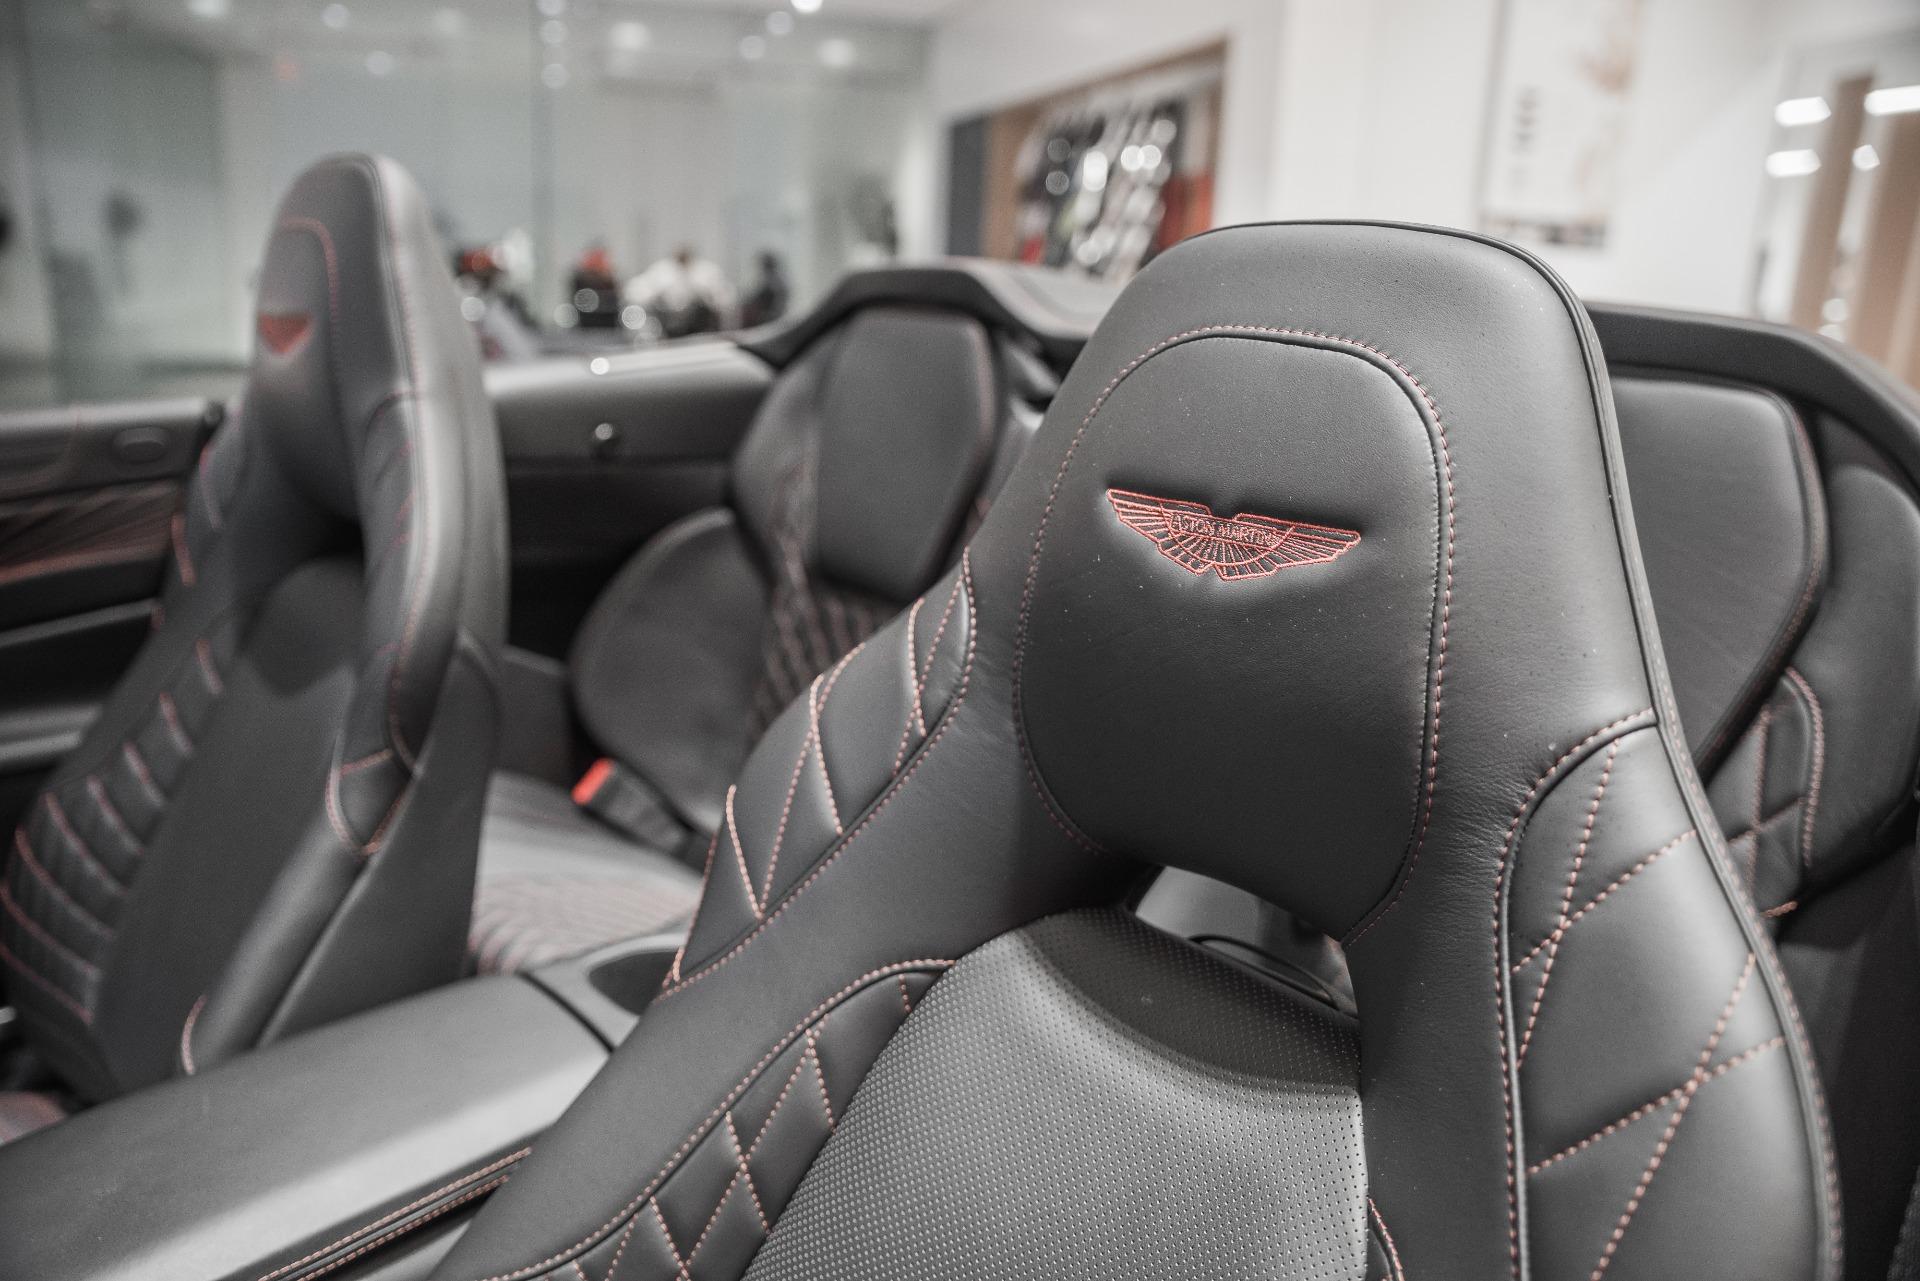 2018 Aston Martin Vanquish Volante Stock 8nk03742 For Sale Near